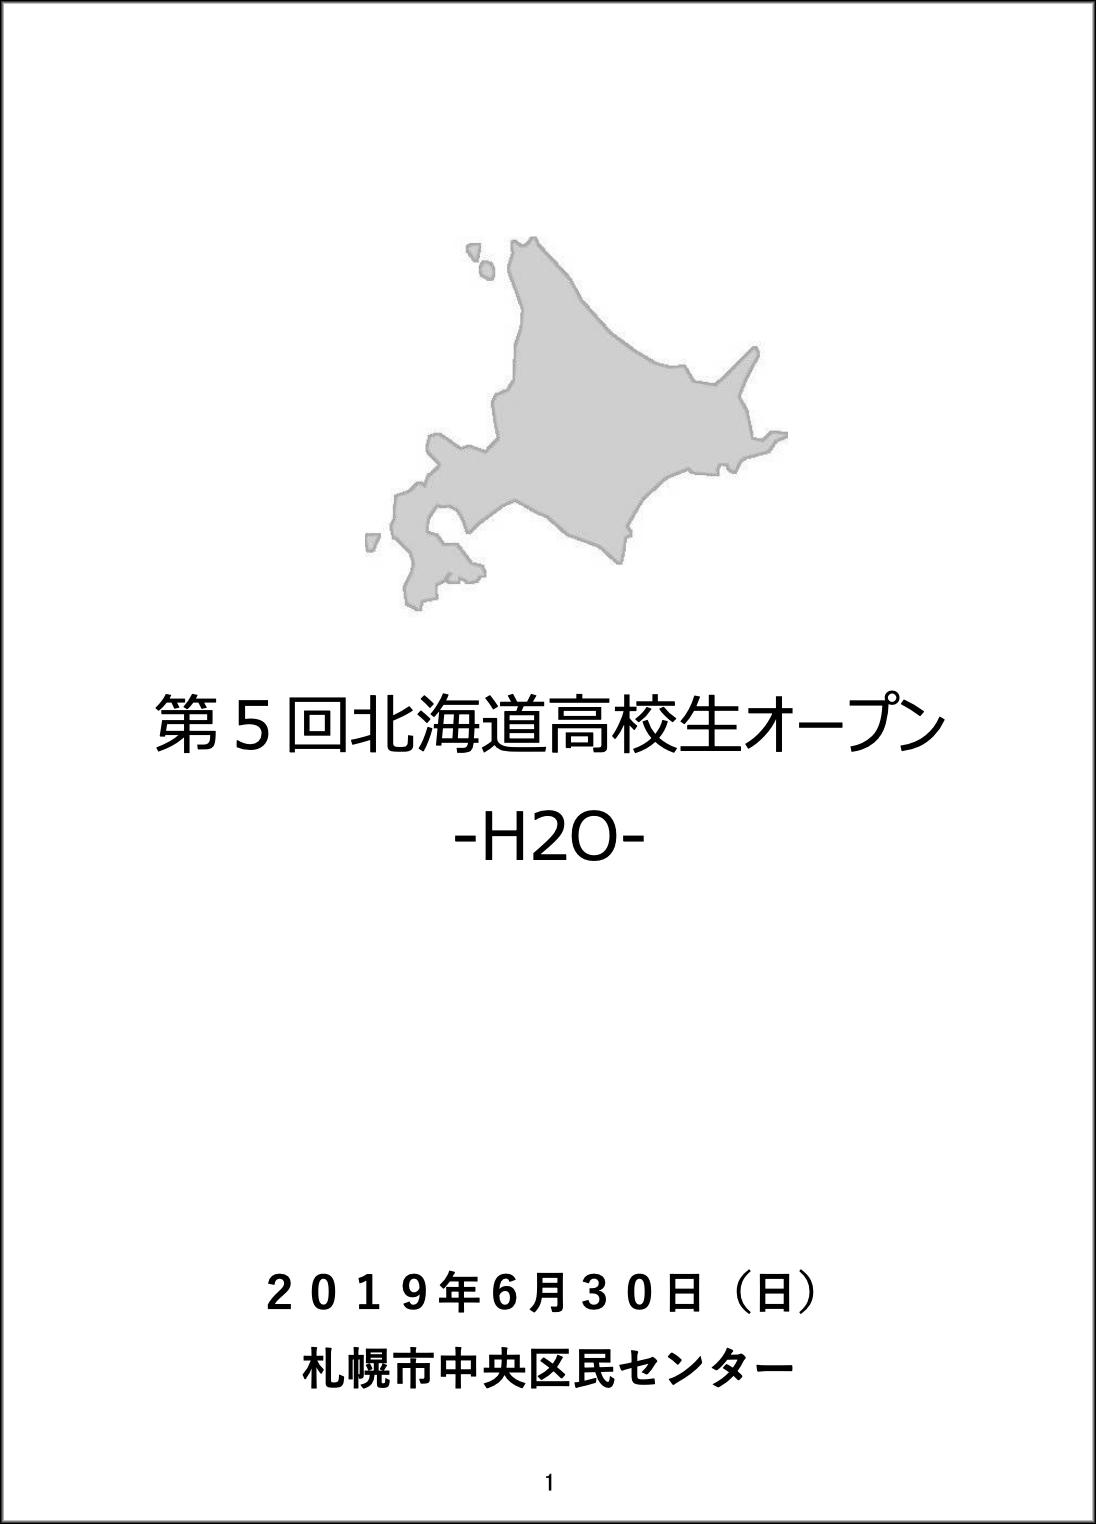 C32401693